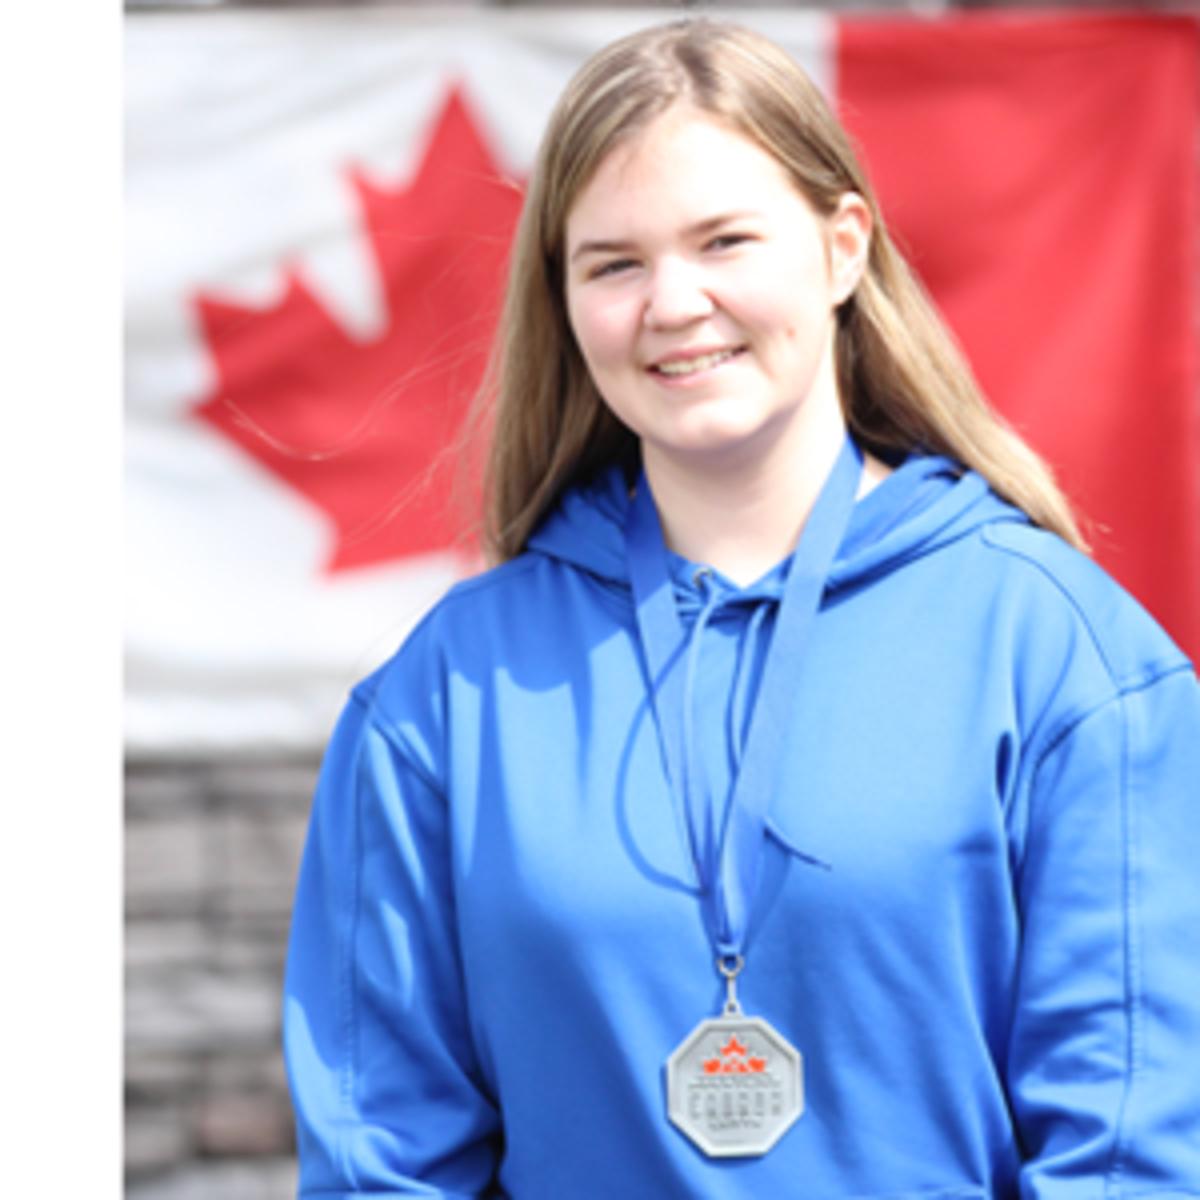 Maren with her medal